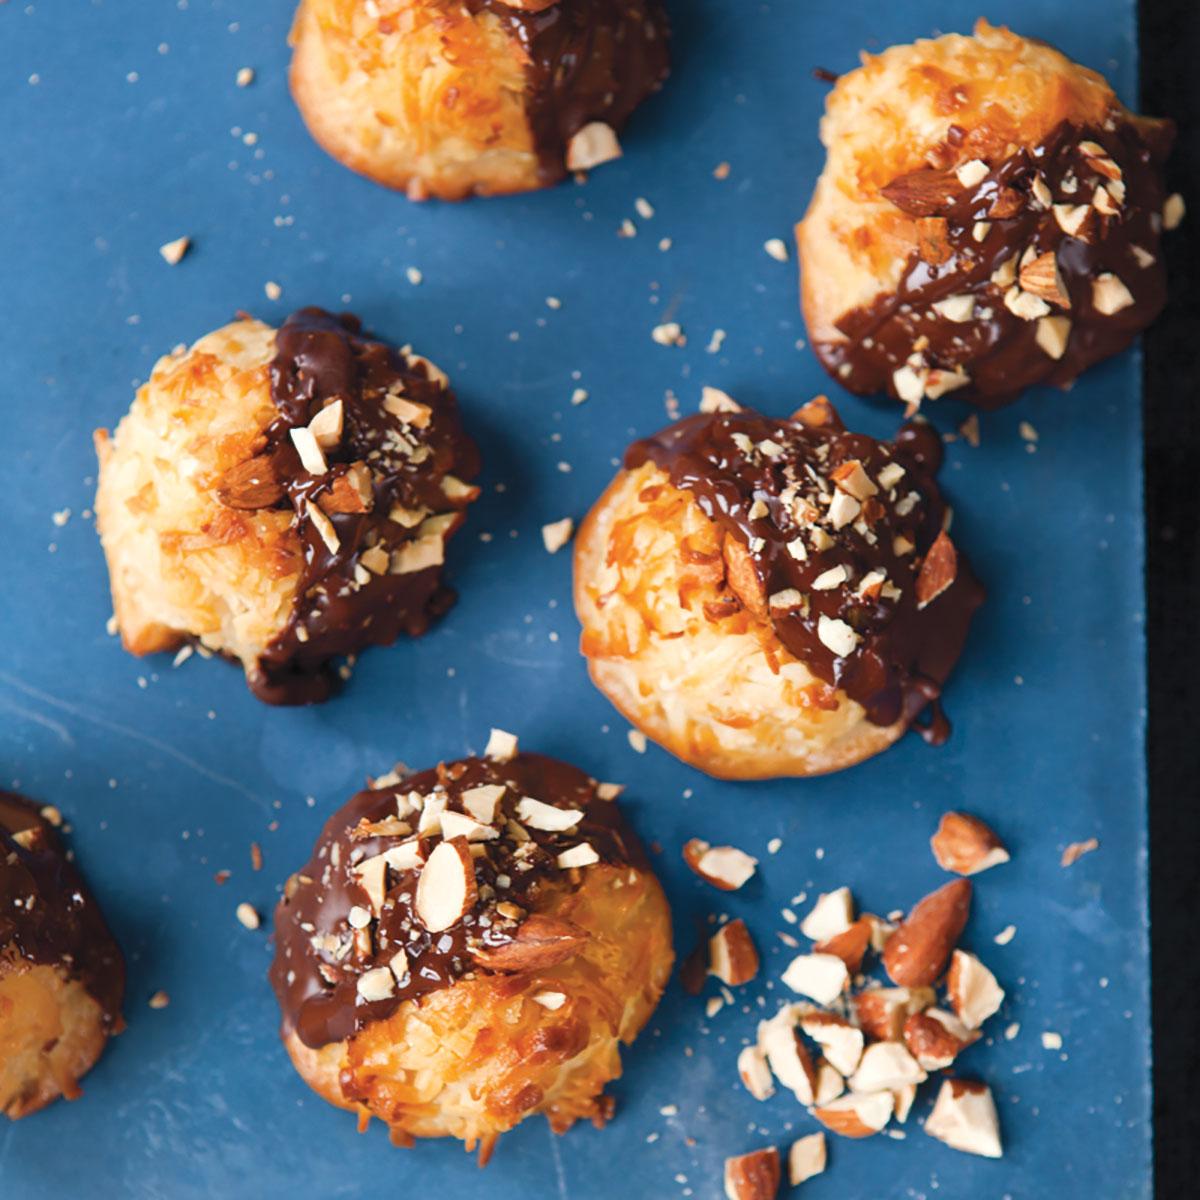 Danny-Macaroon-Chocolate-Almond-Product-2-(1).jpg